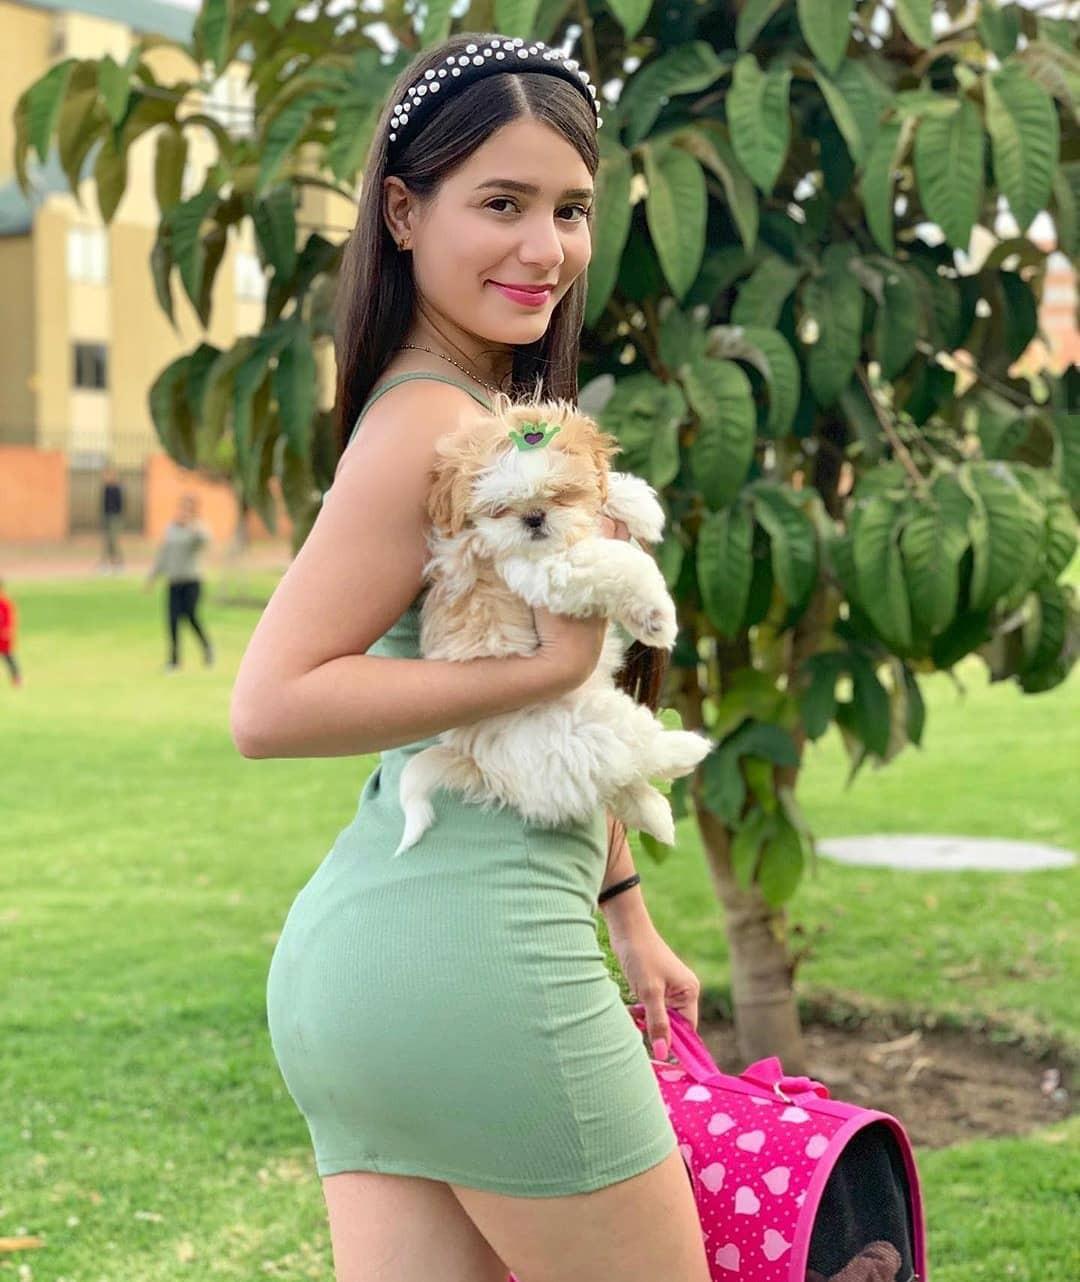 Cute Hot Girls On The Instagram, Corazón Serrano, Zafiro Sensual